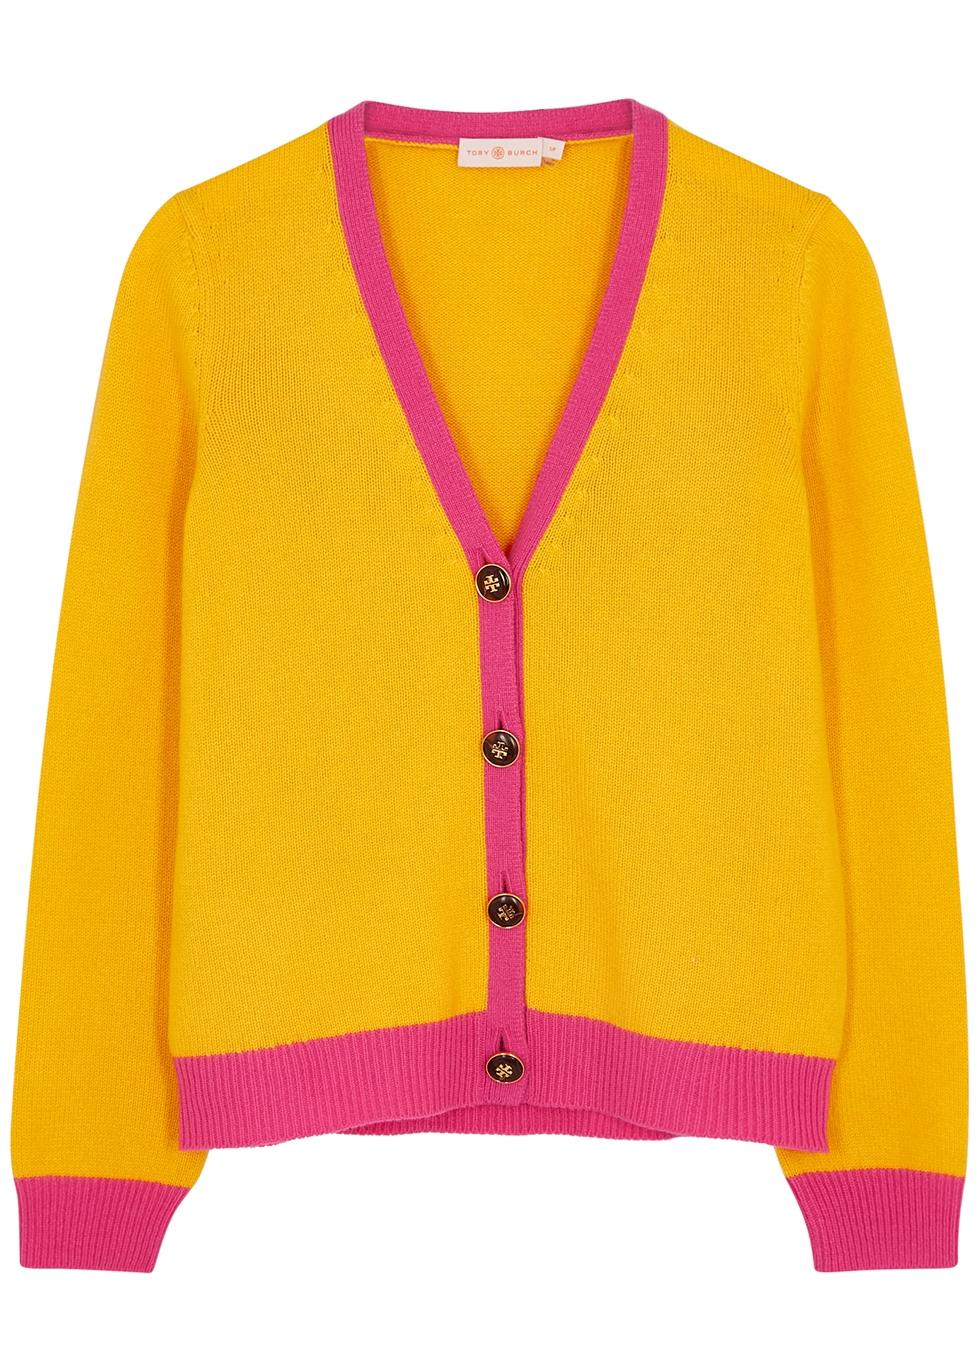 Yellow cashmere cardigan